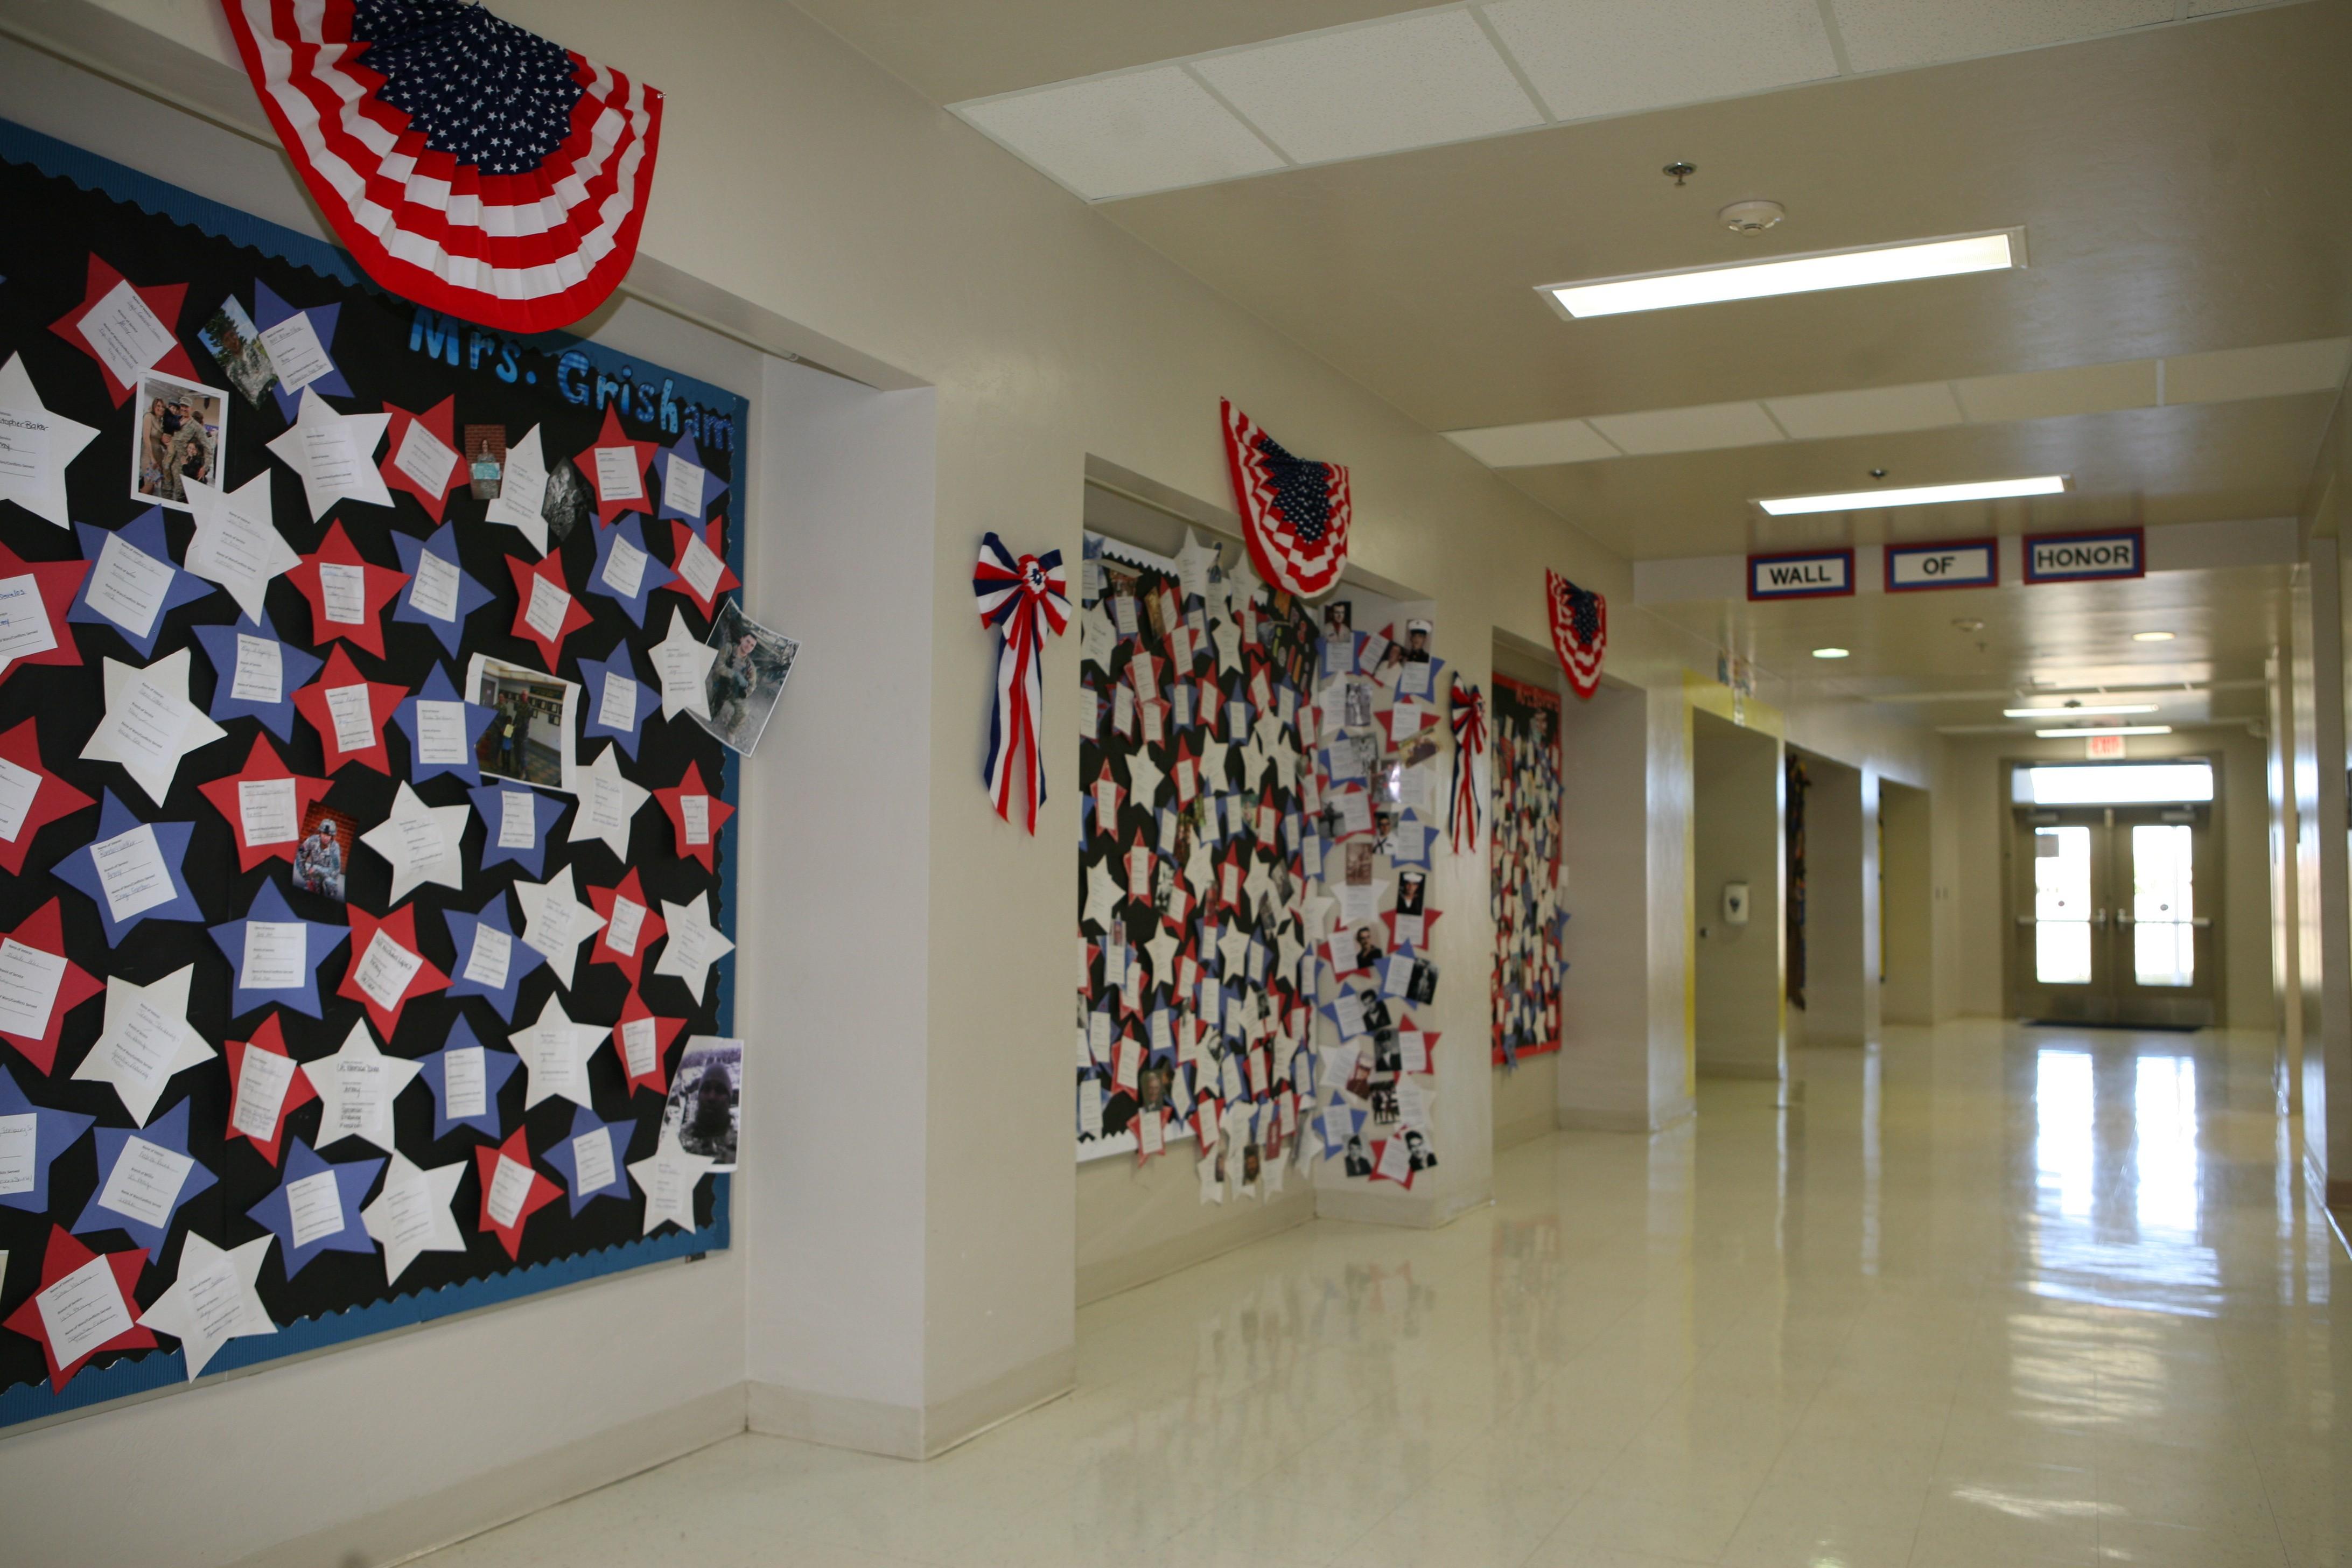 Second Grade Hosts Veterans Day Celebration At Fh School